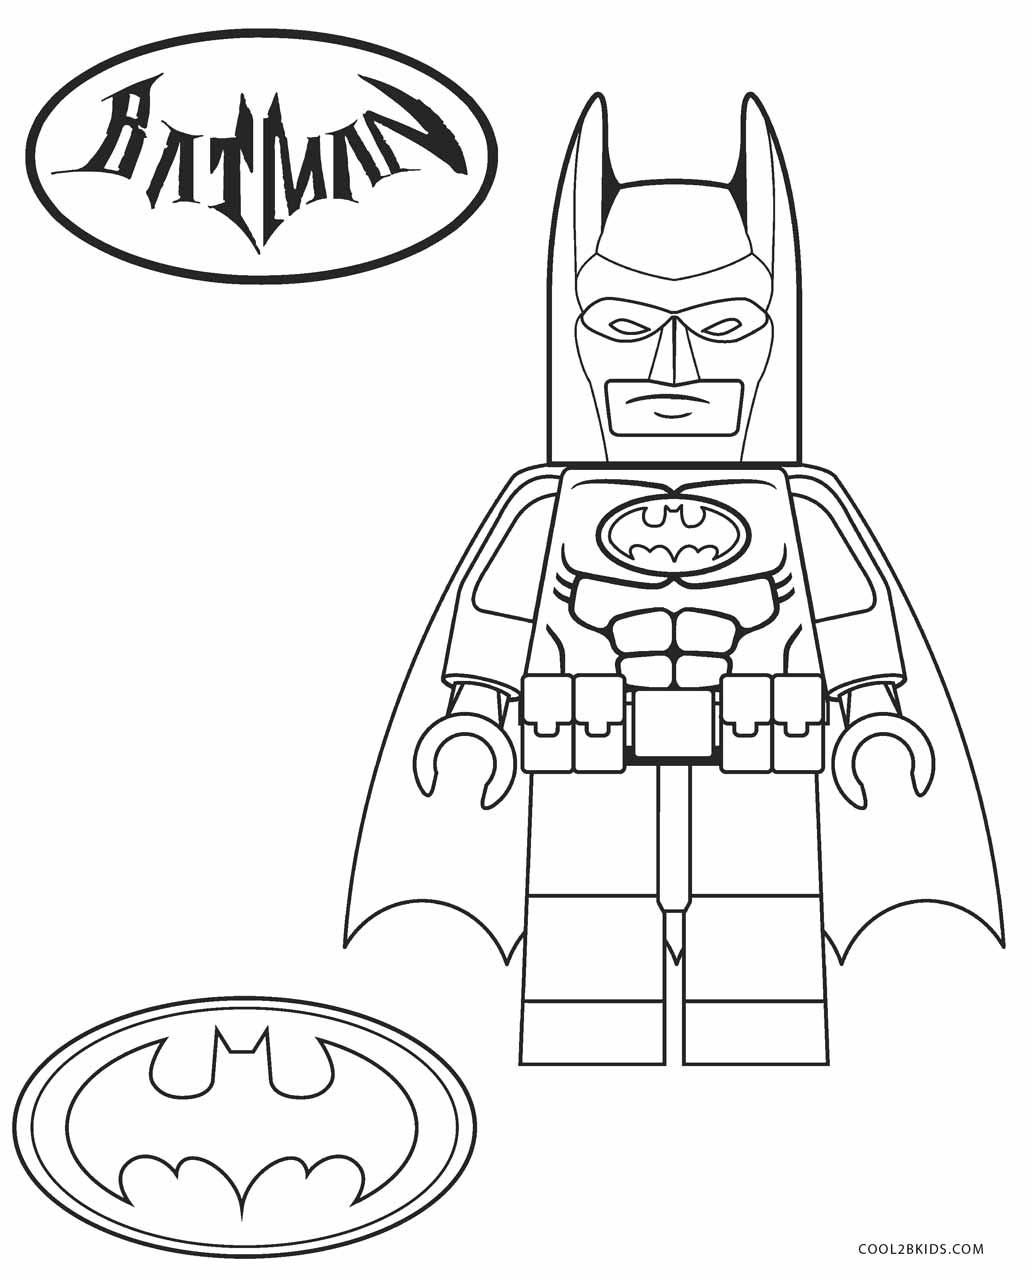 batman lego coloring pages printables top 10 batman printable coloring pages for kids and adults coloring printables batman lego pages